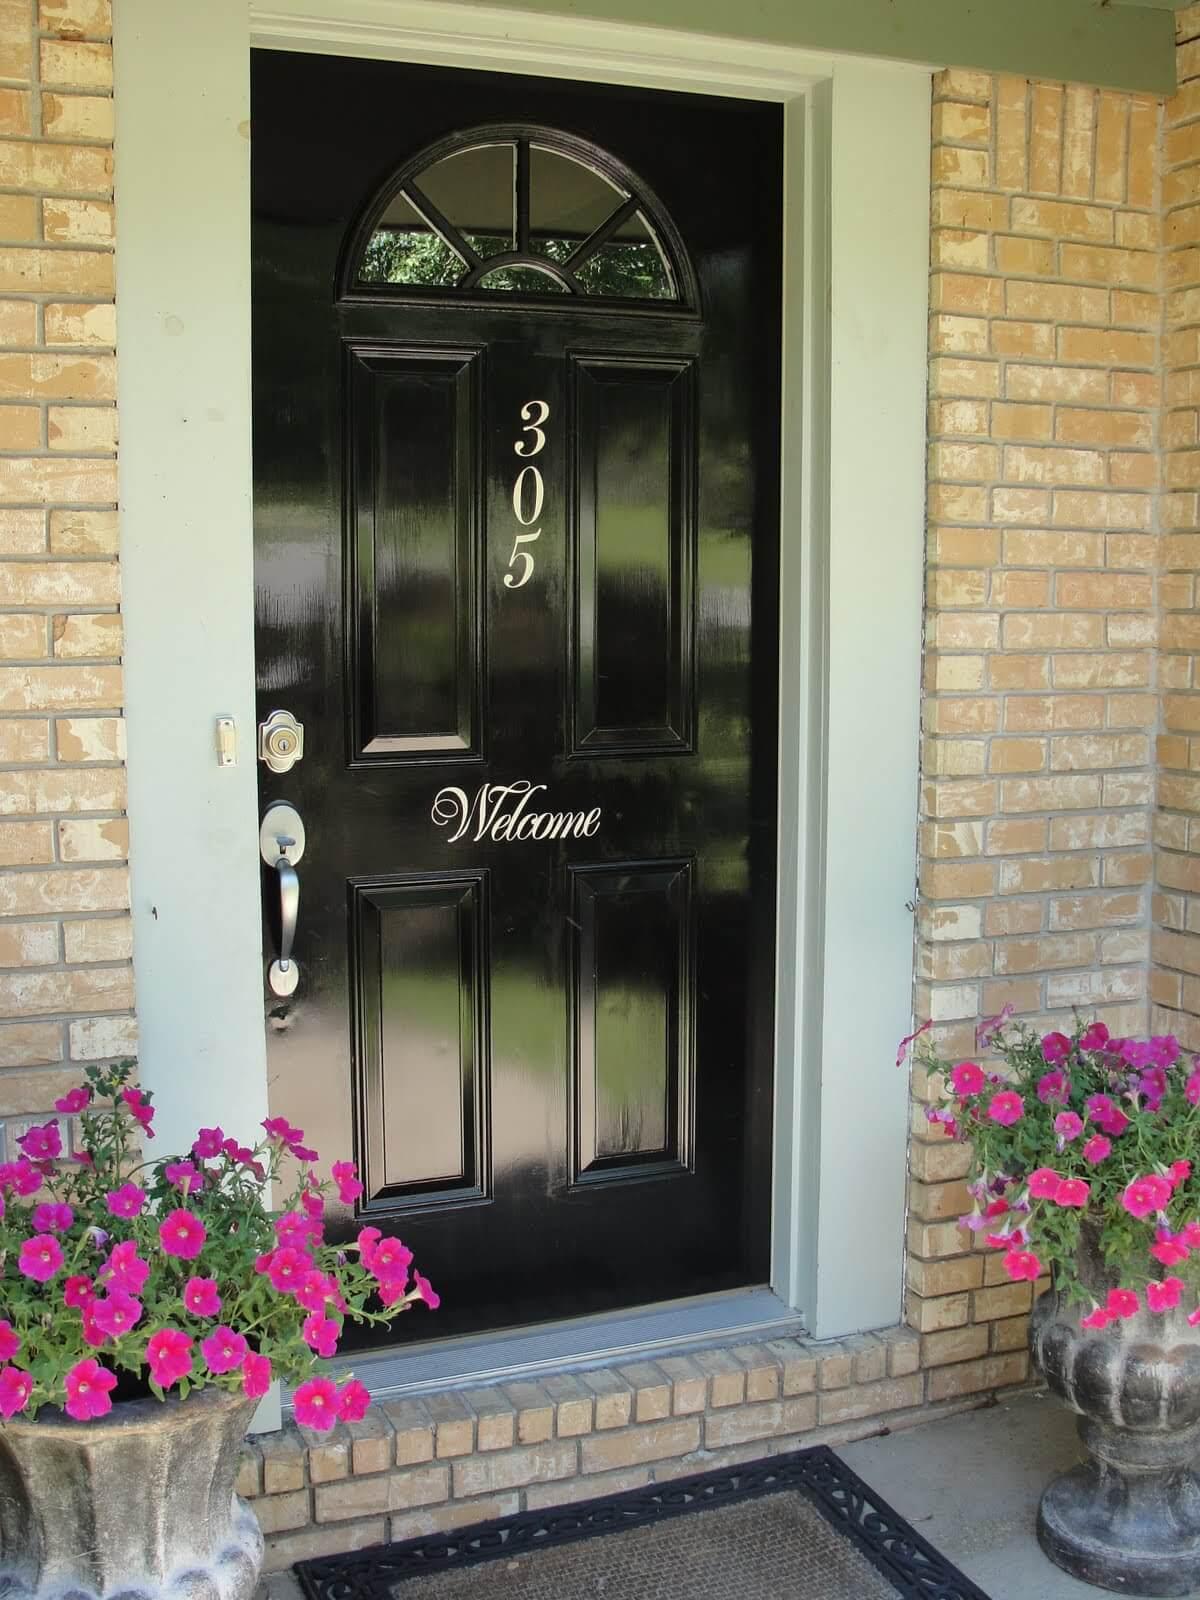 30 Best Front Door Color Ideas and Designs for 2020 on Door Color Ideas  id=56819